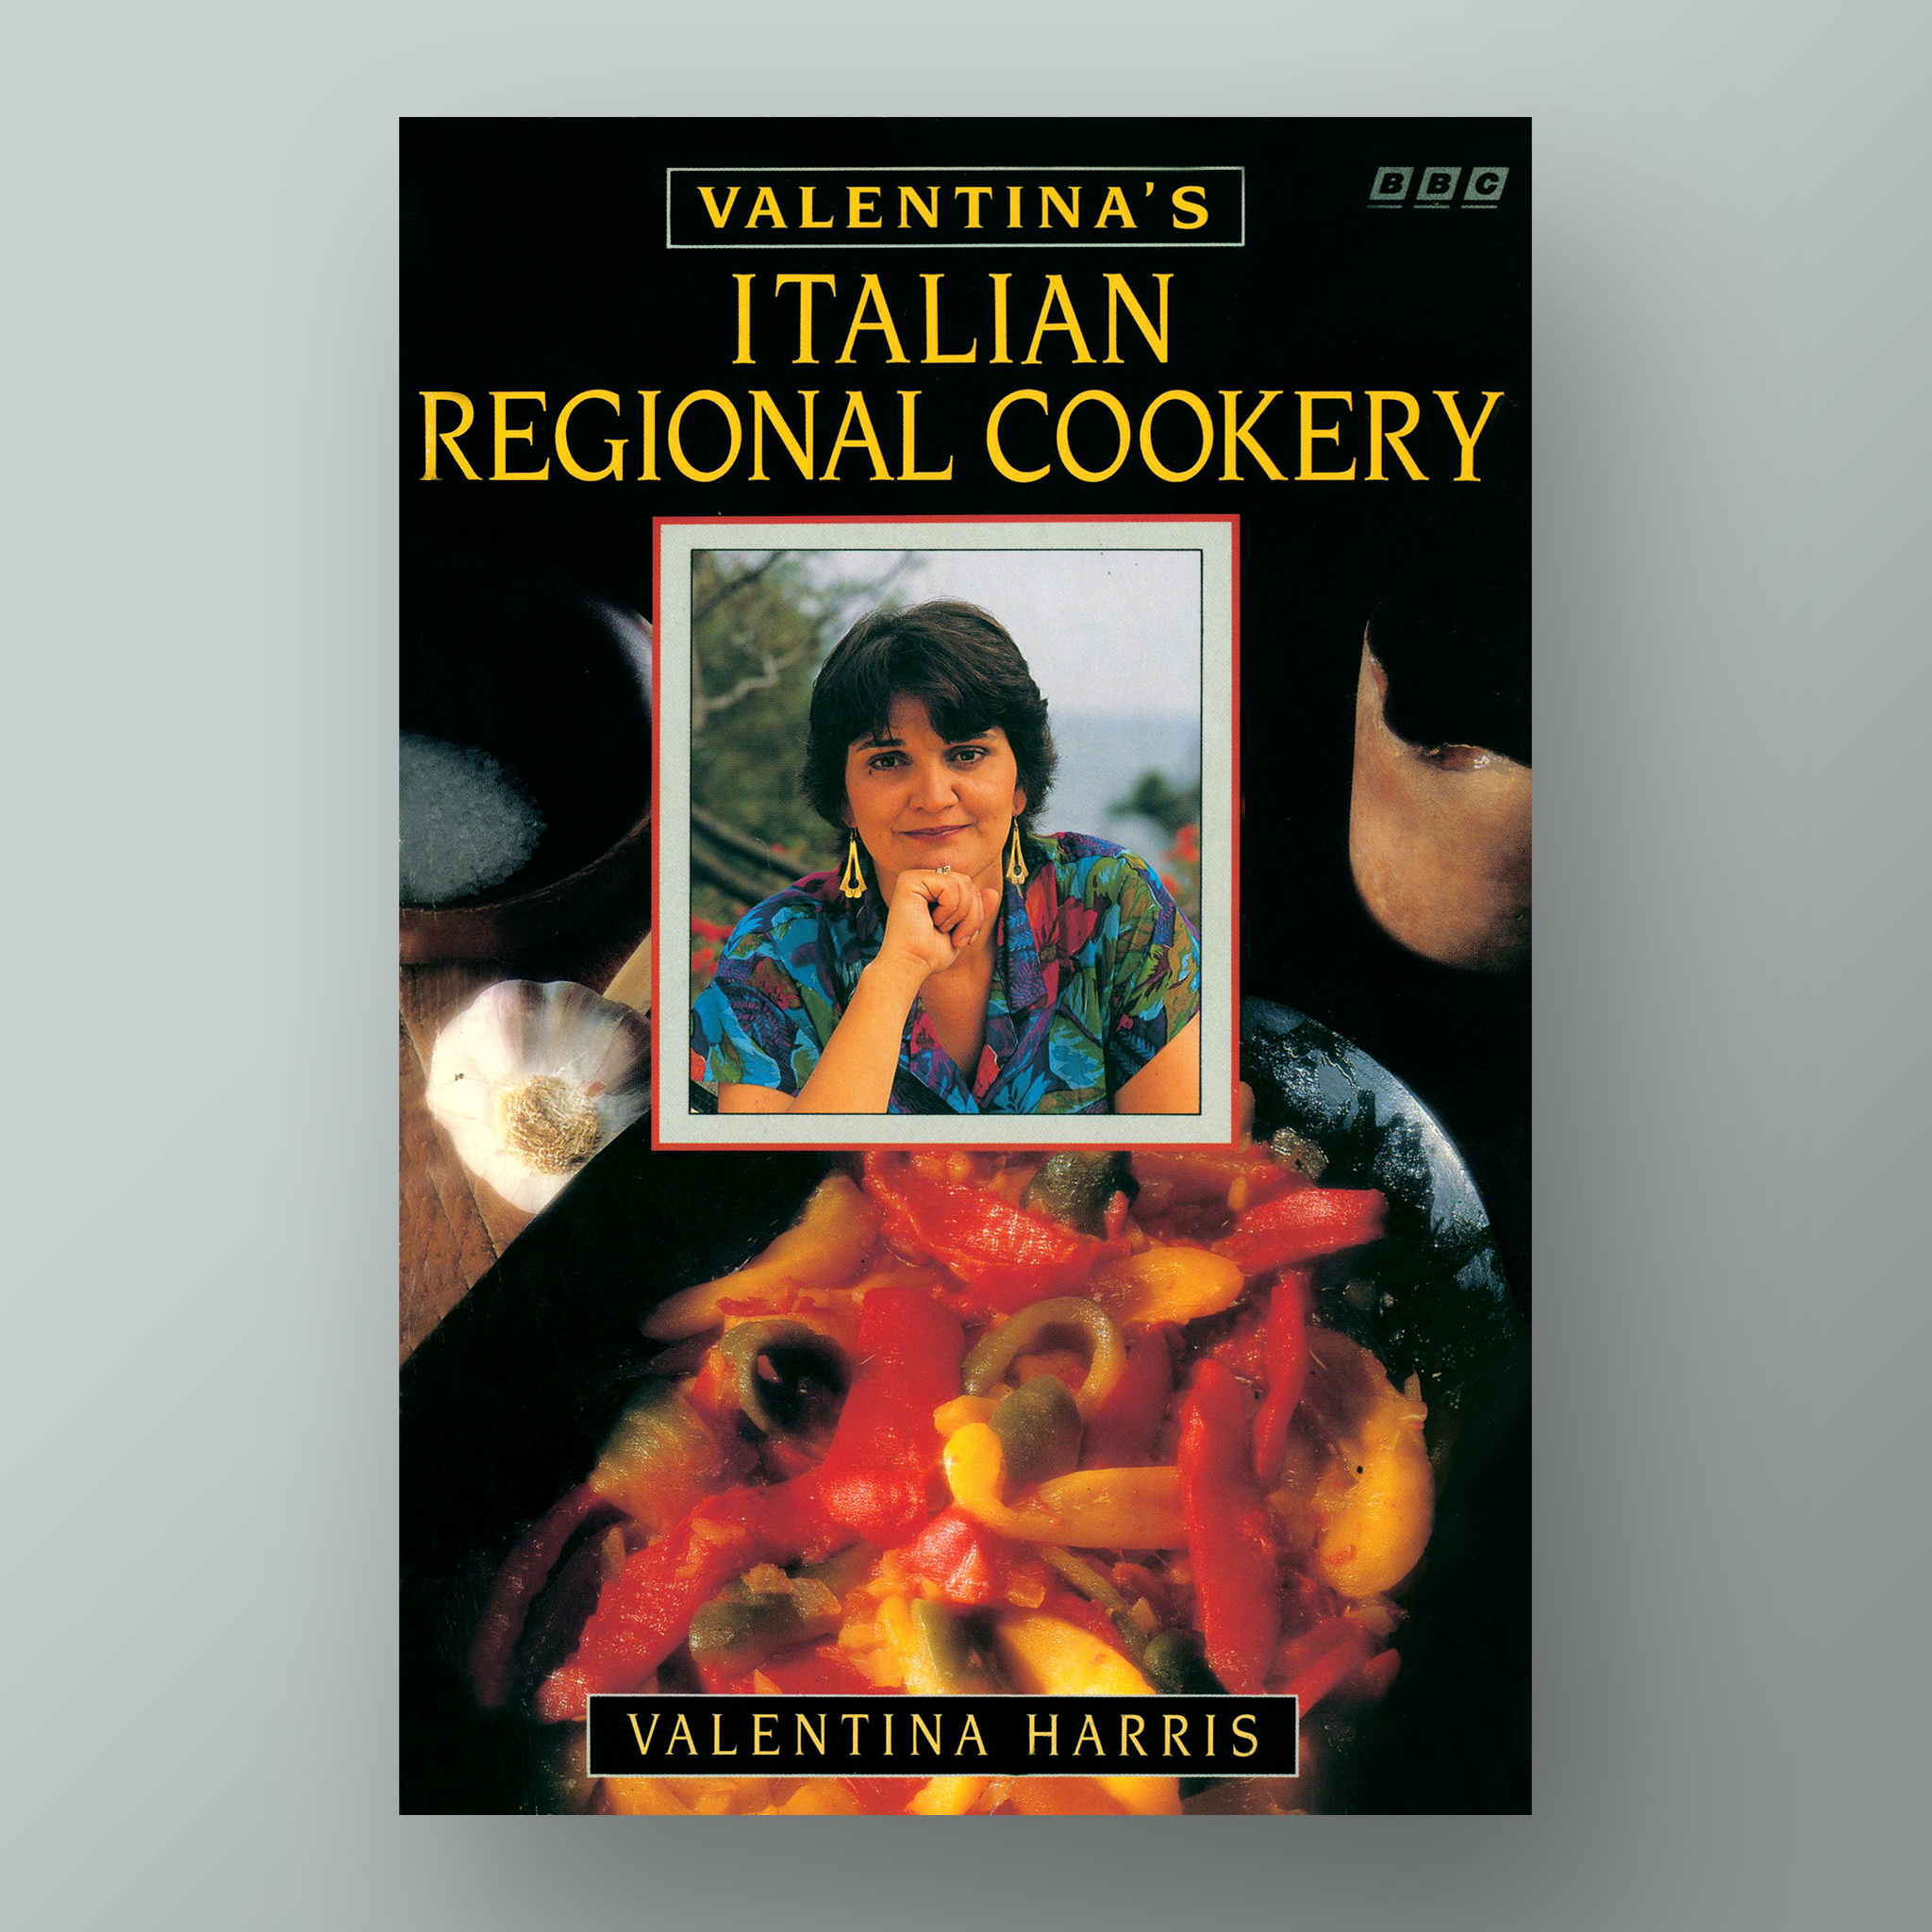 Valentina's Italian Regional Cookery  cookbook cover